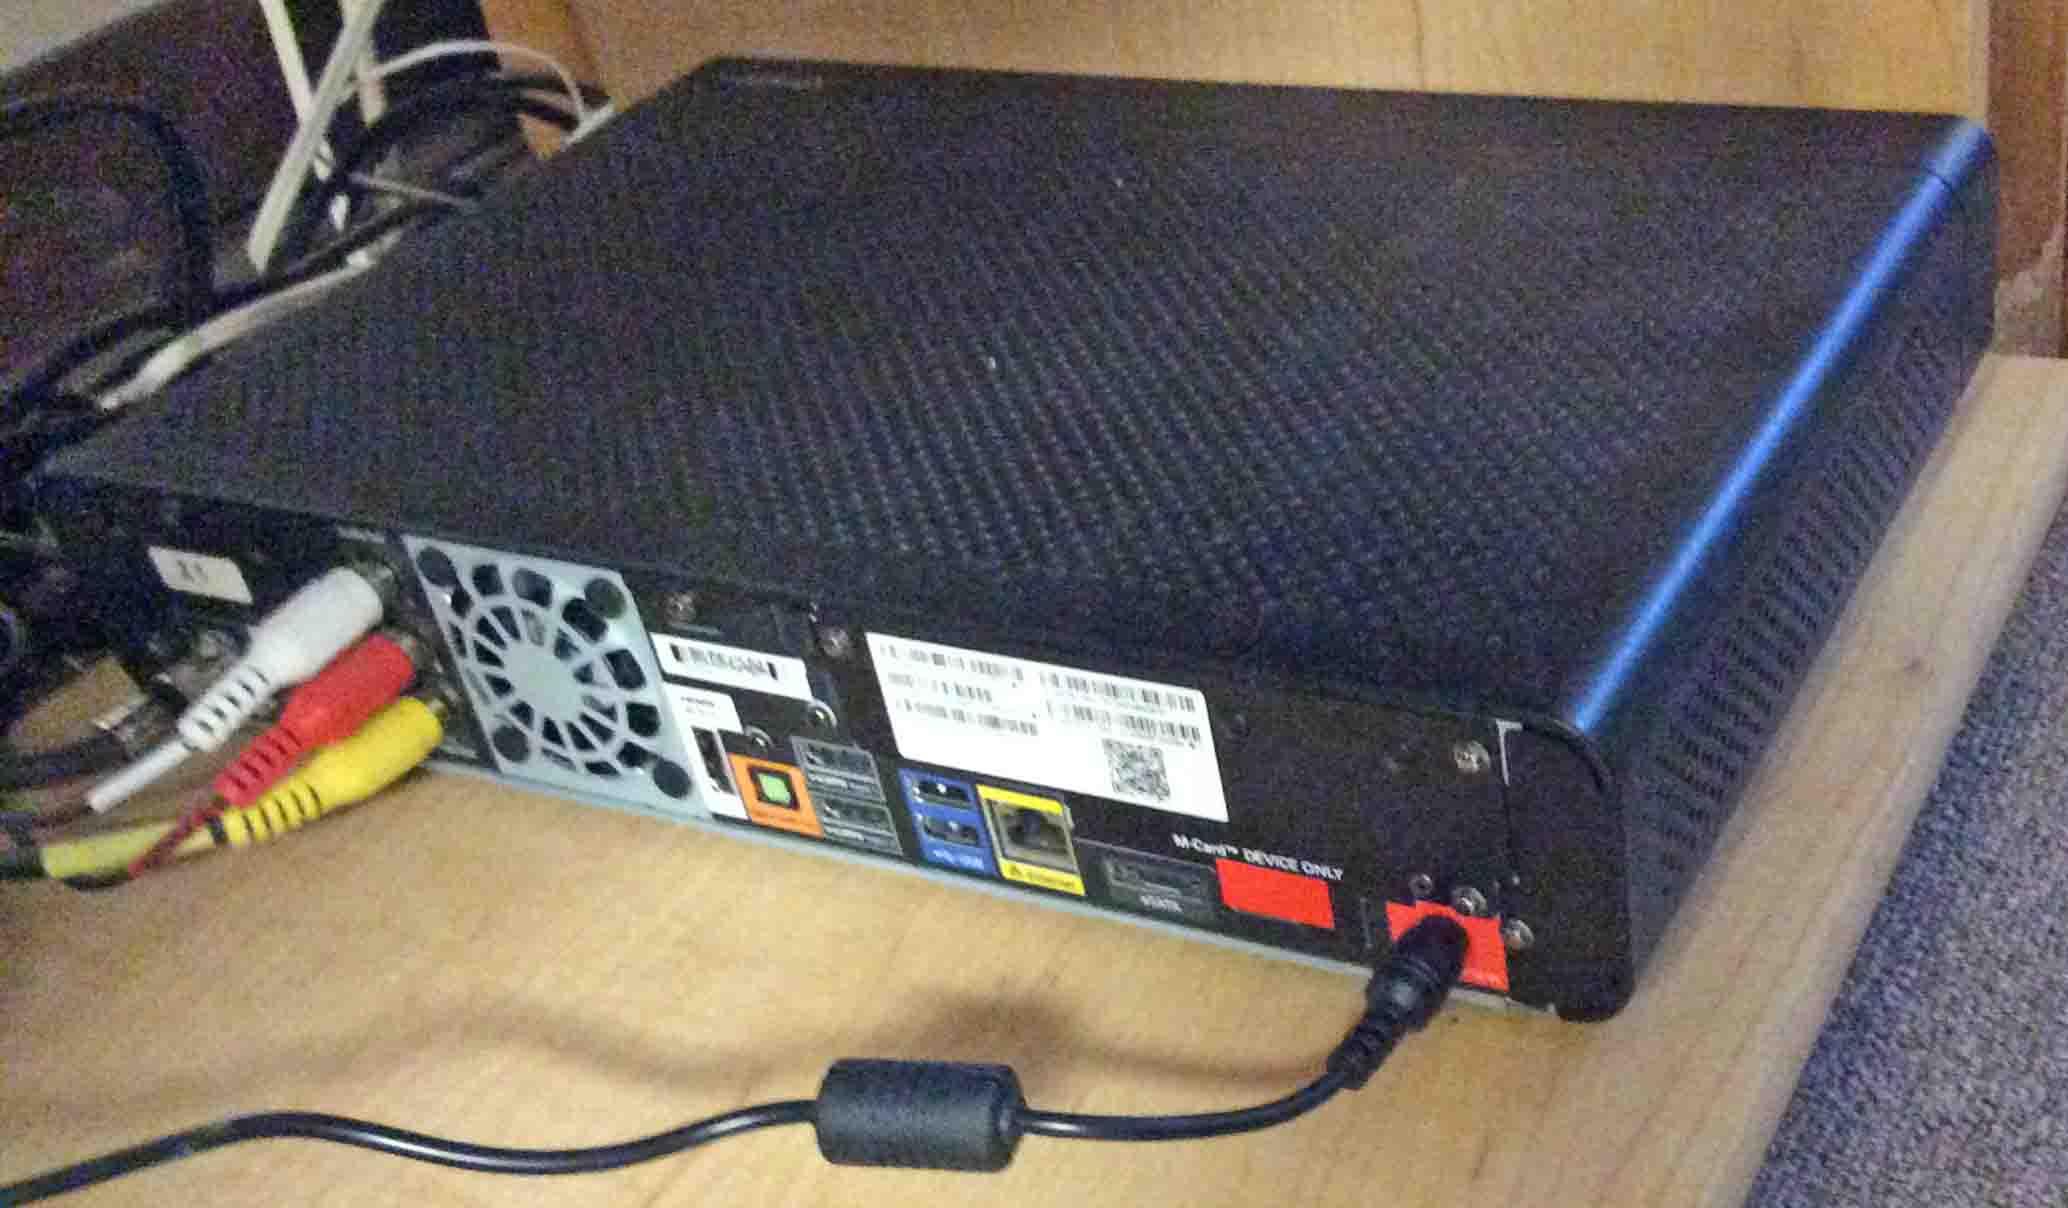 Comcast Xfinity X1 DVR Service Review | Tom's Tek Stop